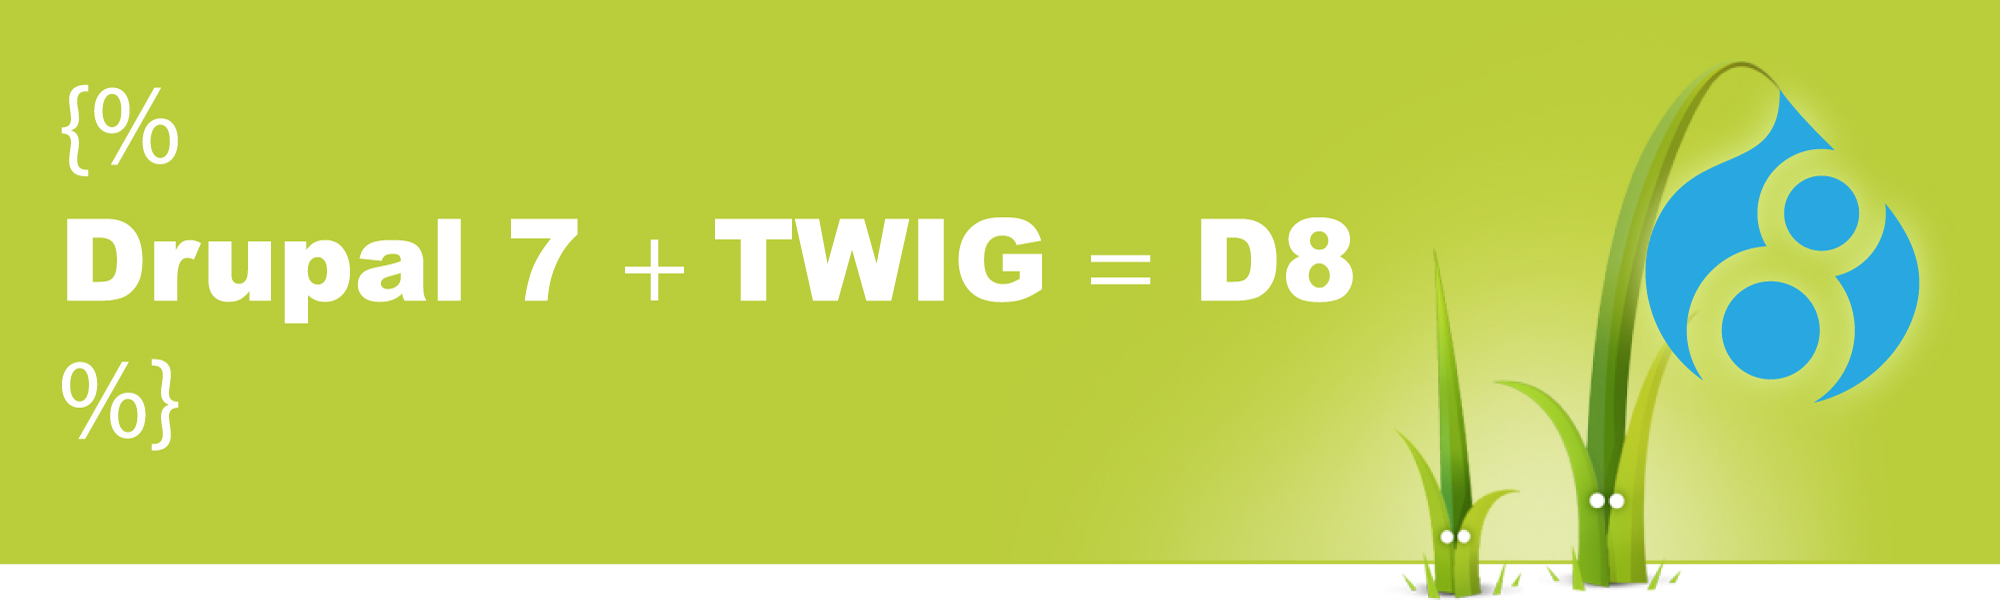 Drupal 7 + Twig = D8